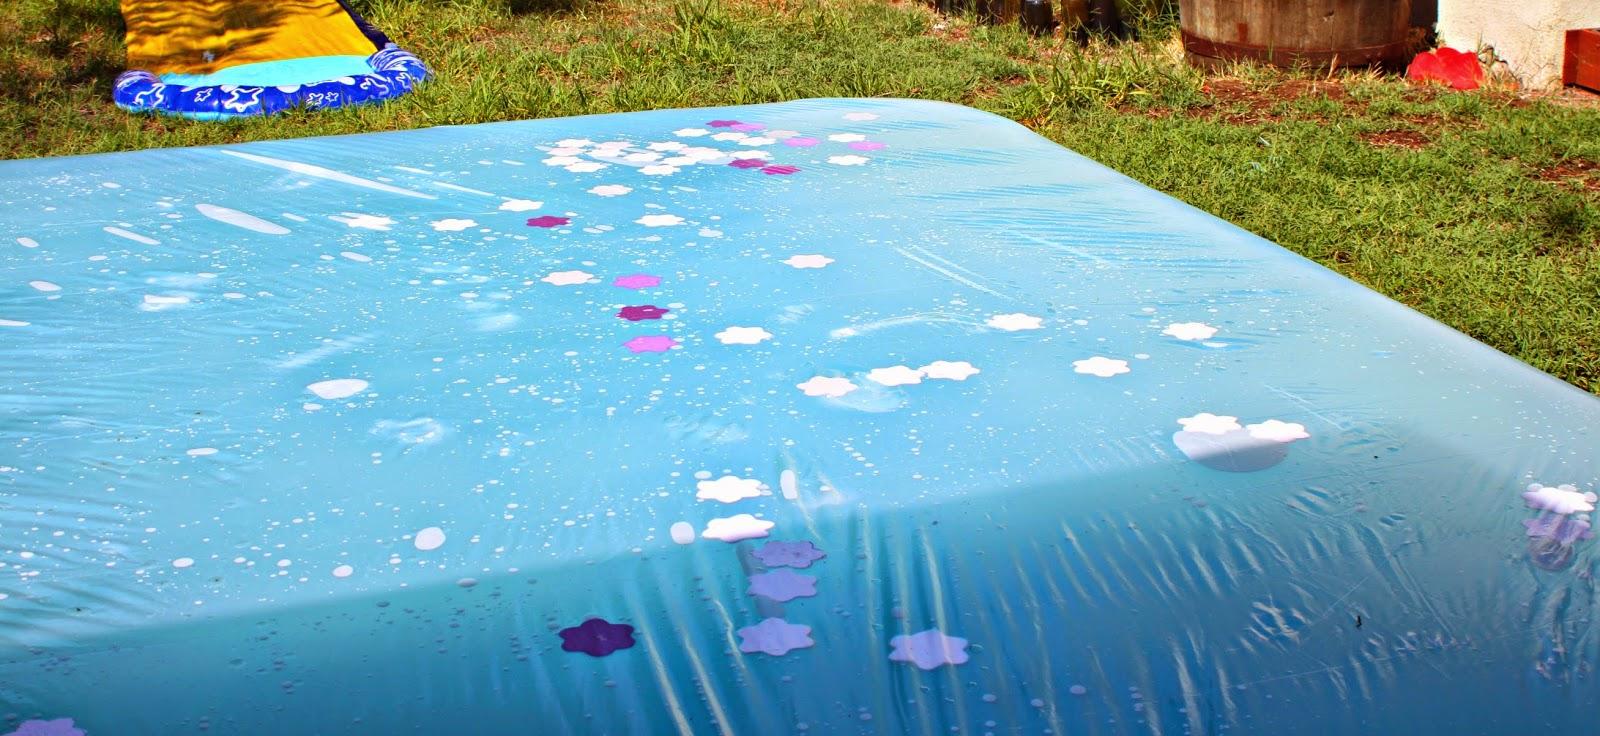 How to make a #backyard water blob { video tutorial.